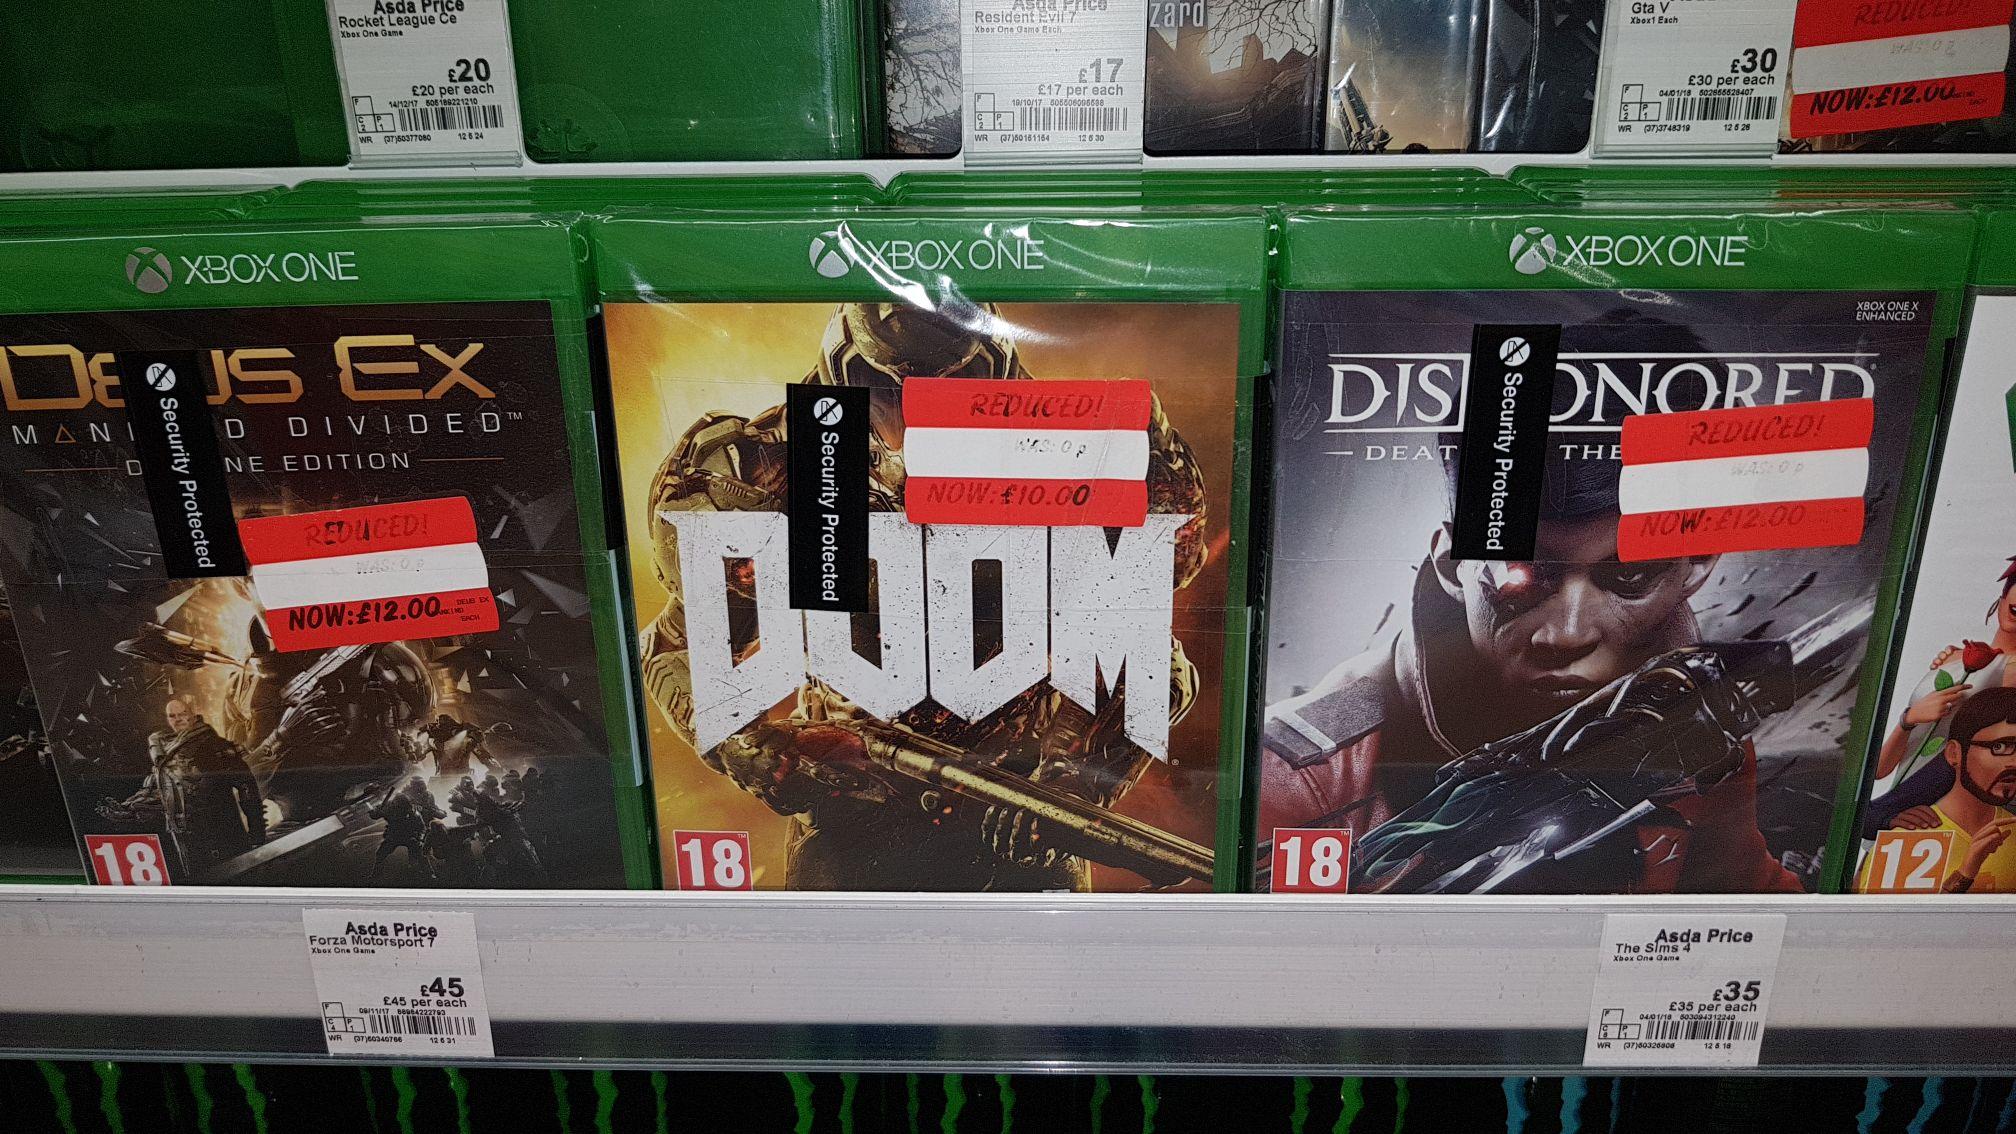 Asda prices xbox one games - Deus Ex - £12 / Doom - £10 / Dishonored - £12 (Warrington store)